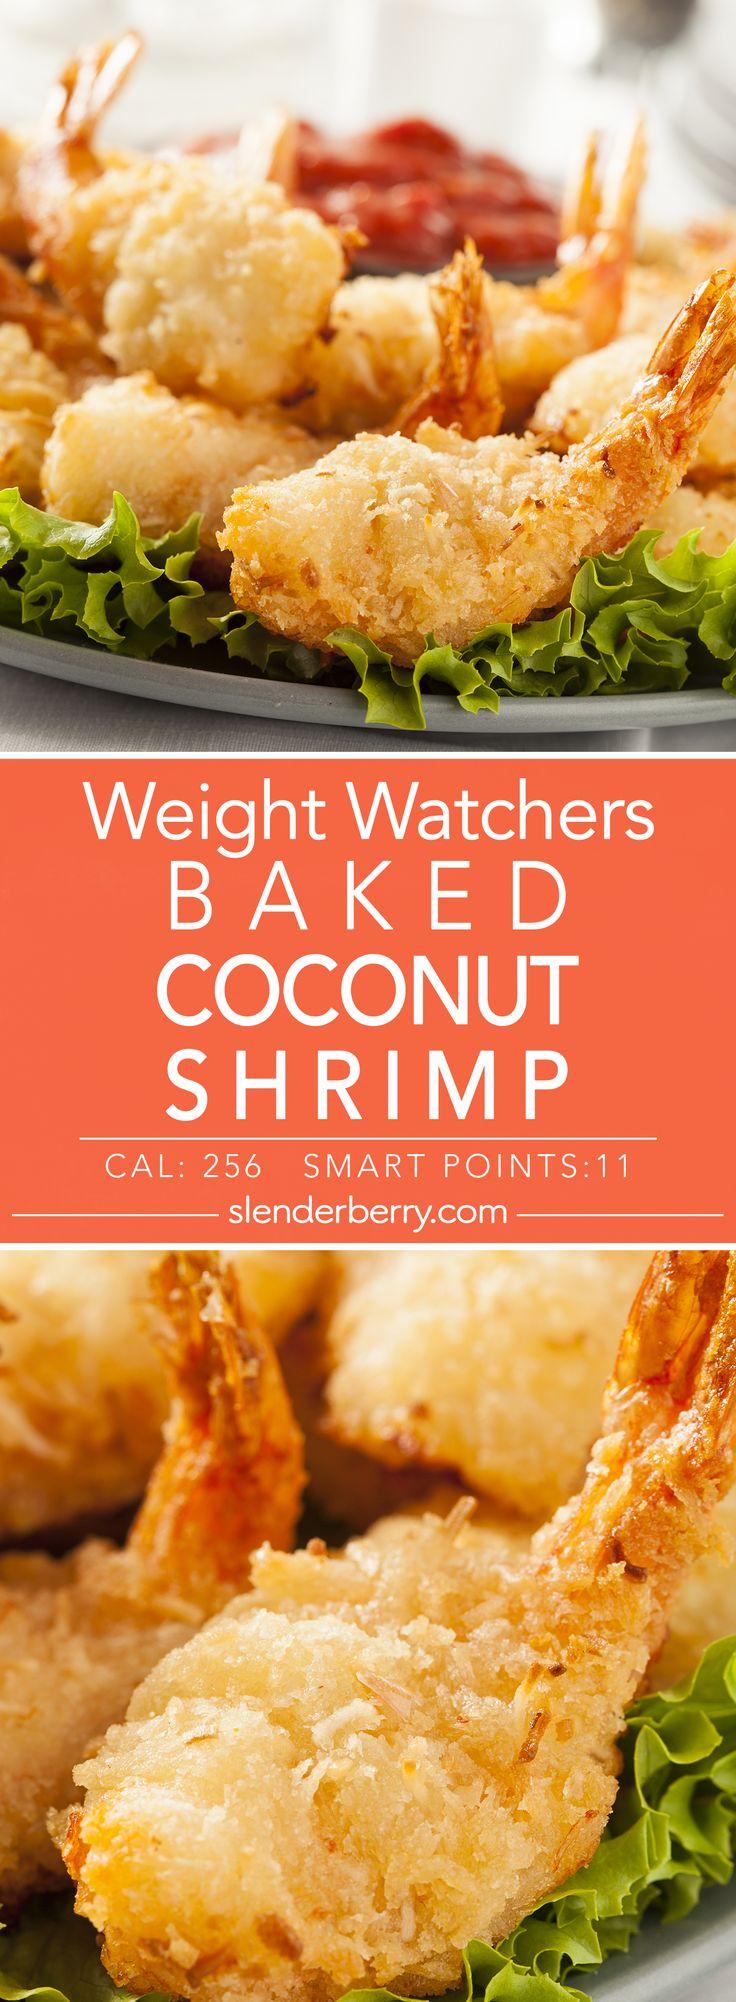 baked coconut shrimp coconut shrimp recipes baked coconut shrimp ...